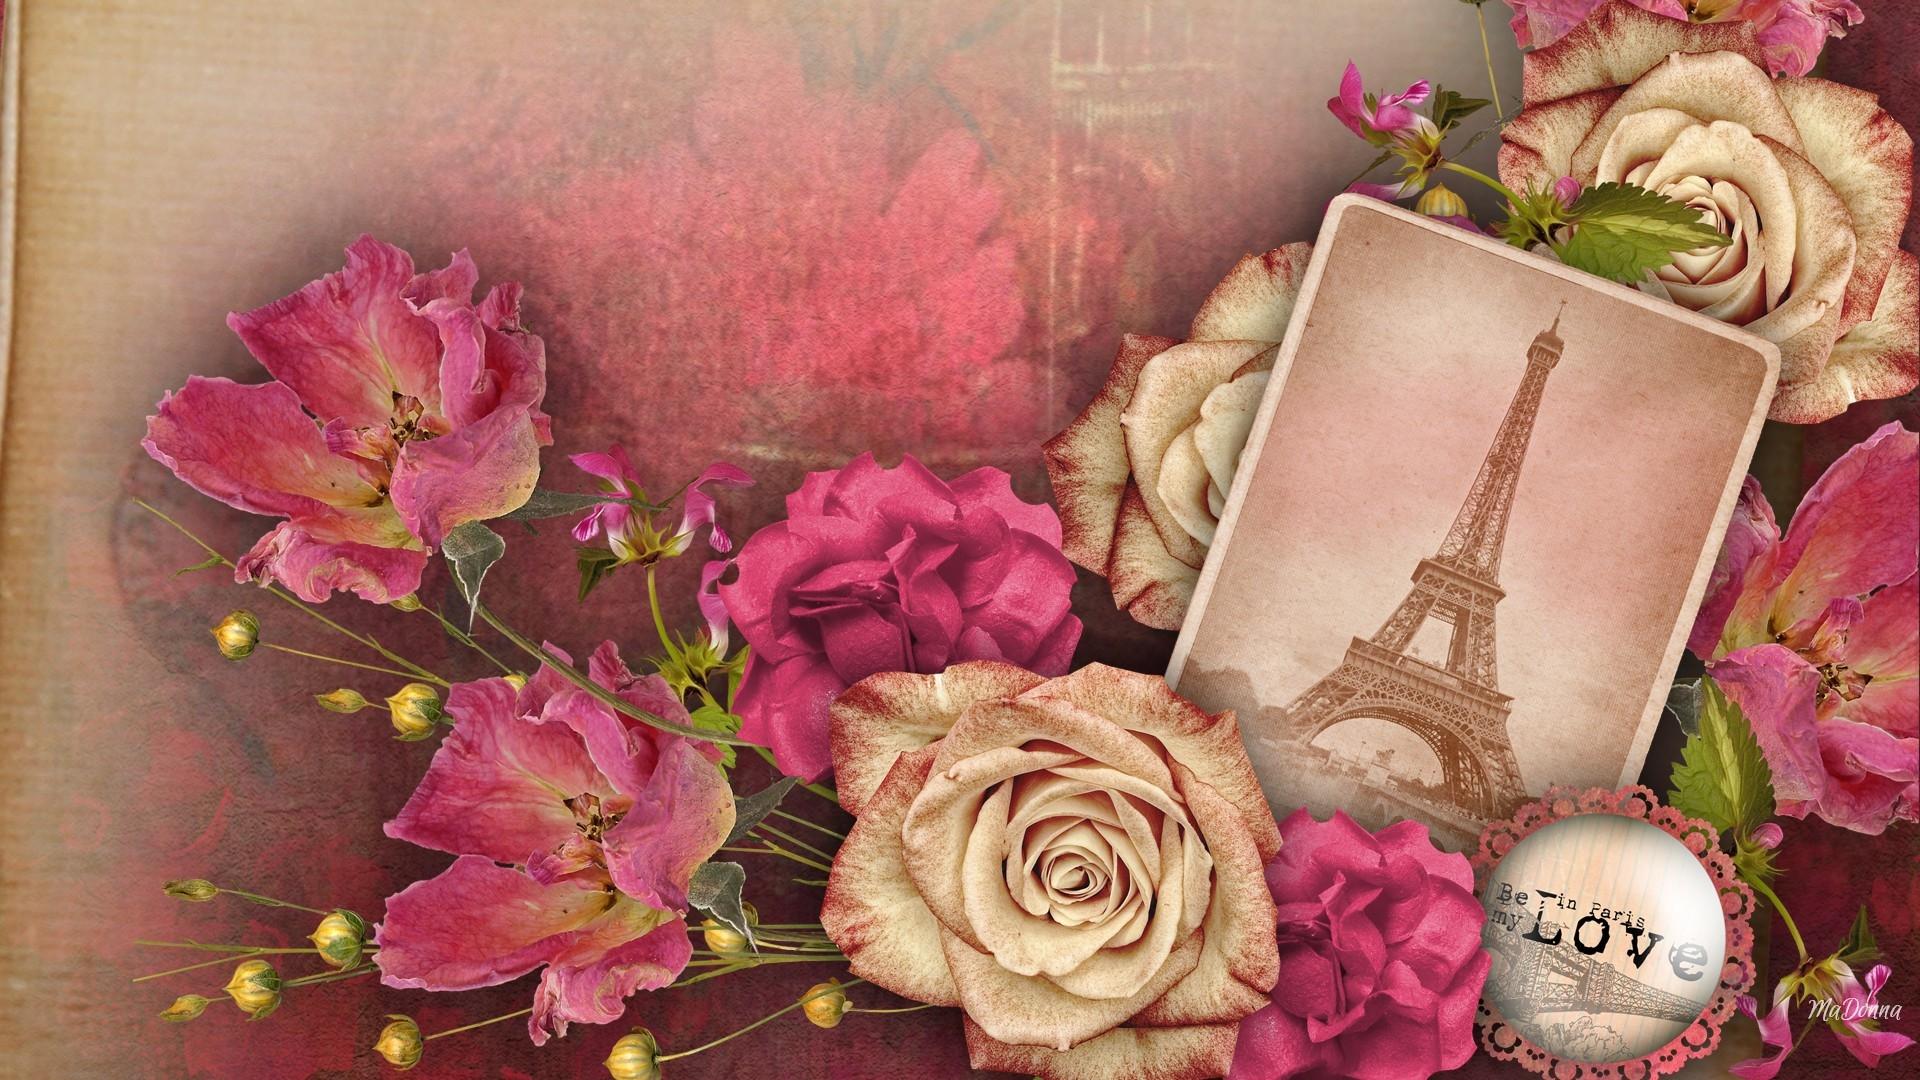 Memories Of Paris Full HD Wallpaper And Background Image